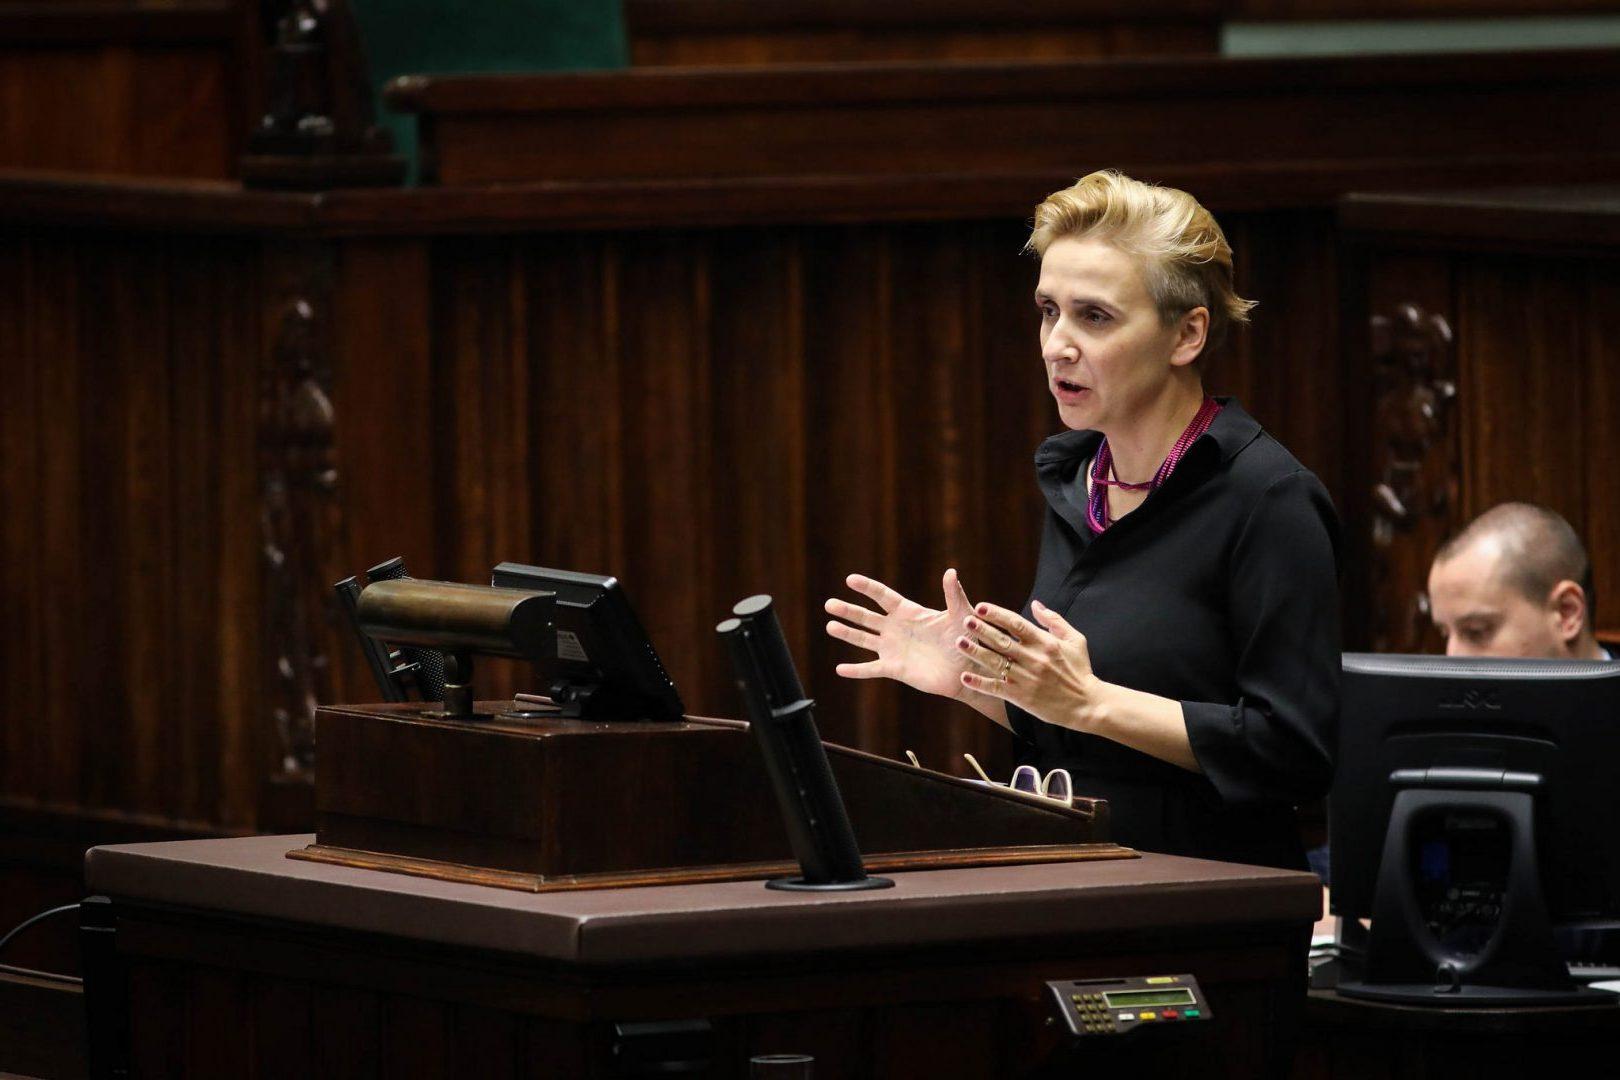 Joanna Scheuring-Wielgus/ fot. Kancelaria Sejmu/Rafal Zambrzycki